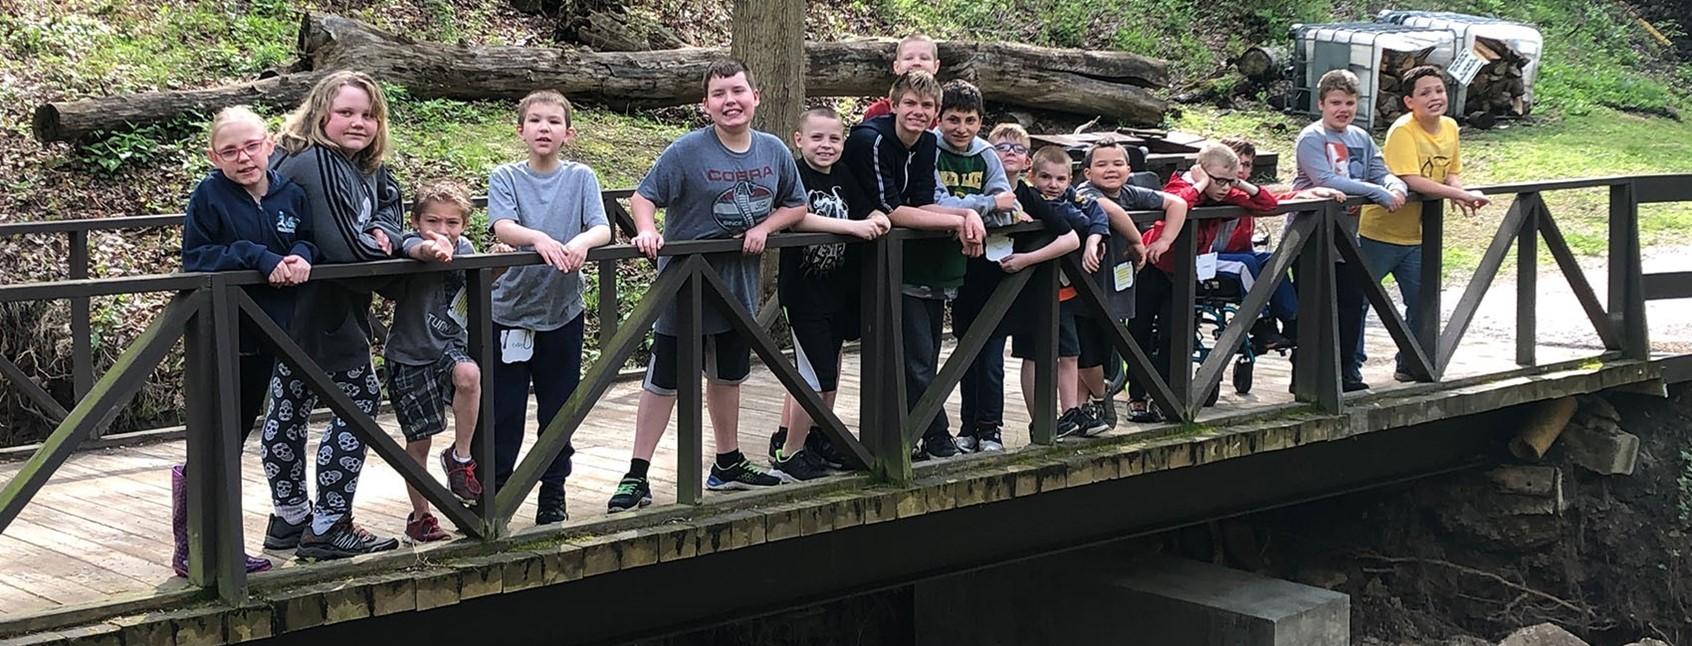 Deer Lakes students experience Camp Guyasuta